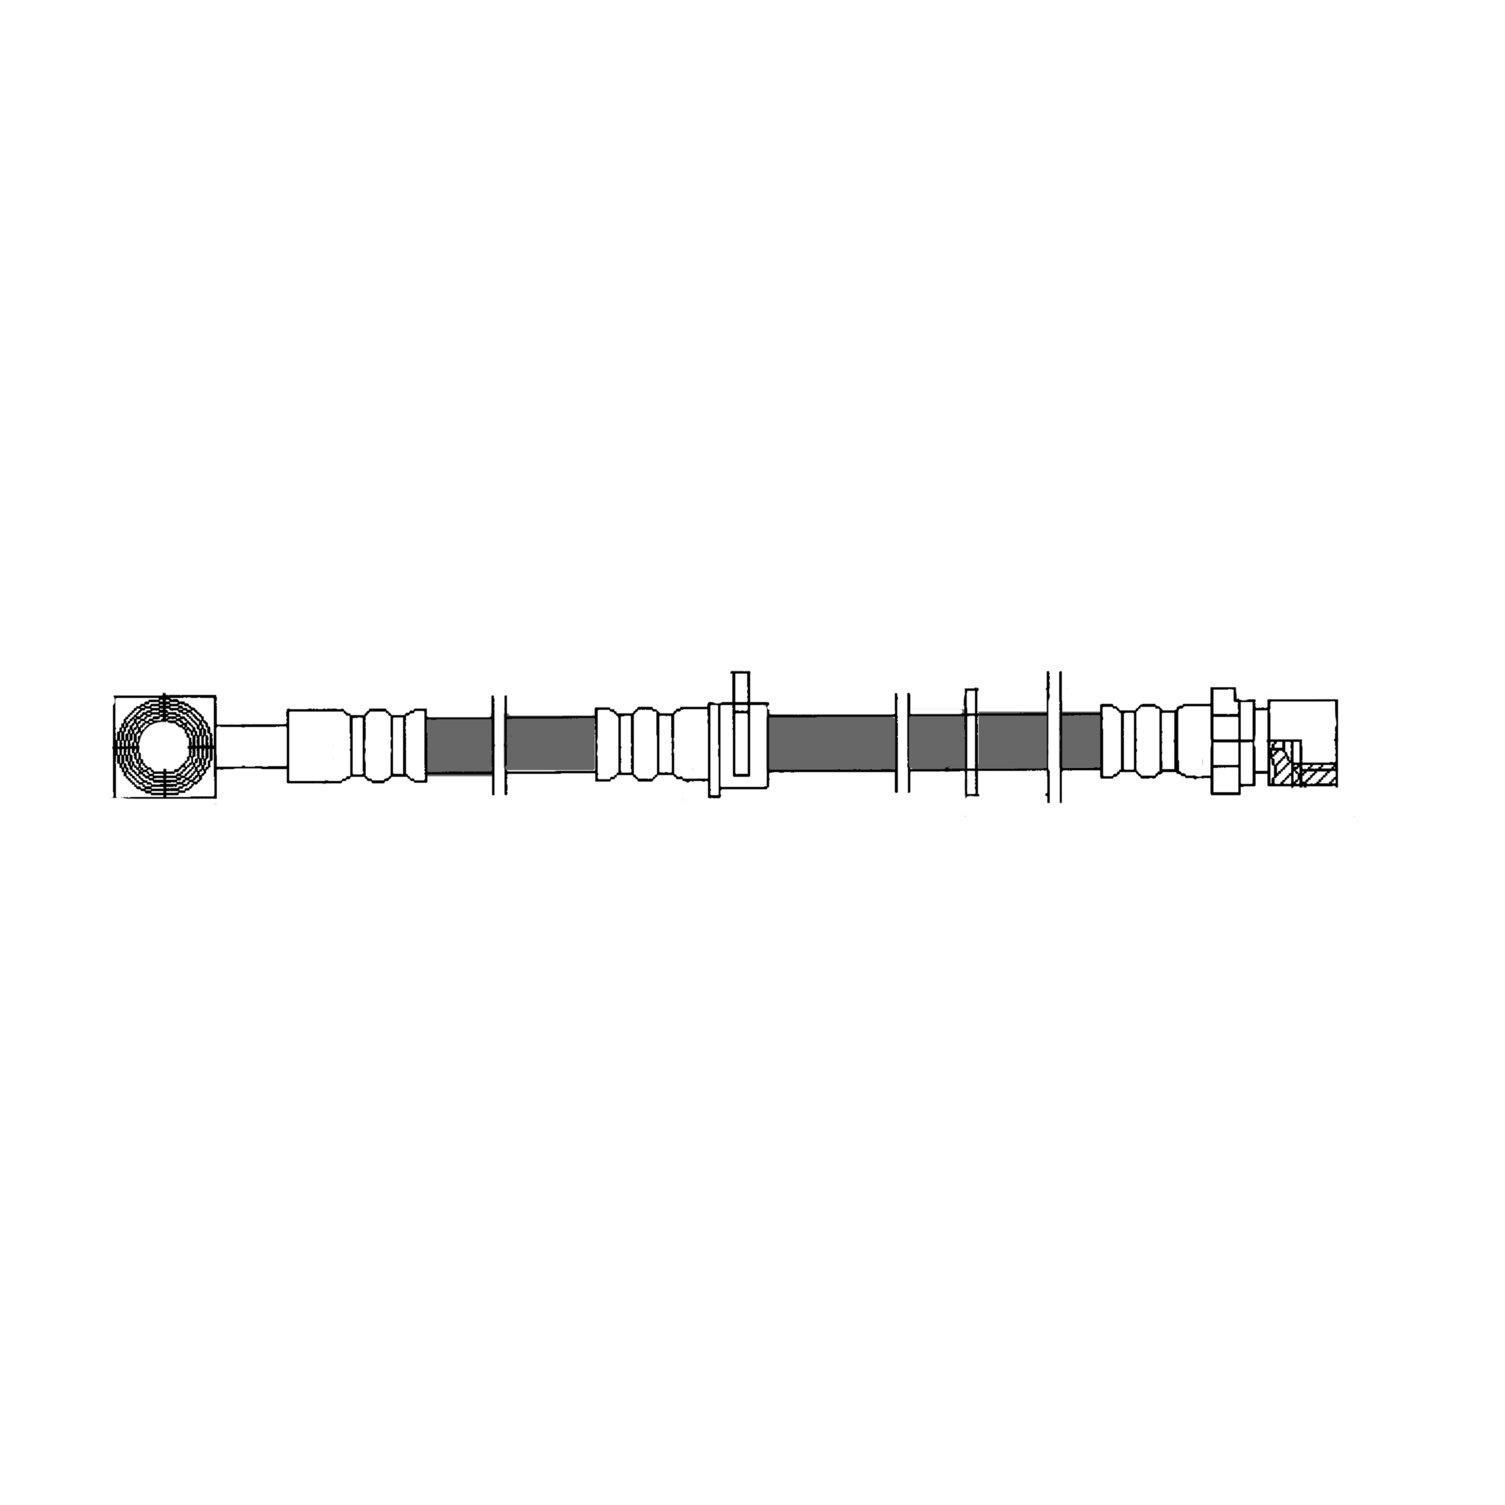 American Shifter 100238 Red Shift Knob with M16 x 1.5 Insert Black Shift Pattern 44n